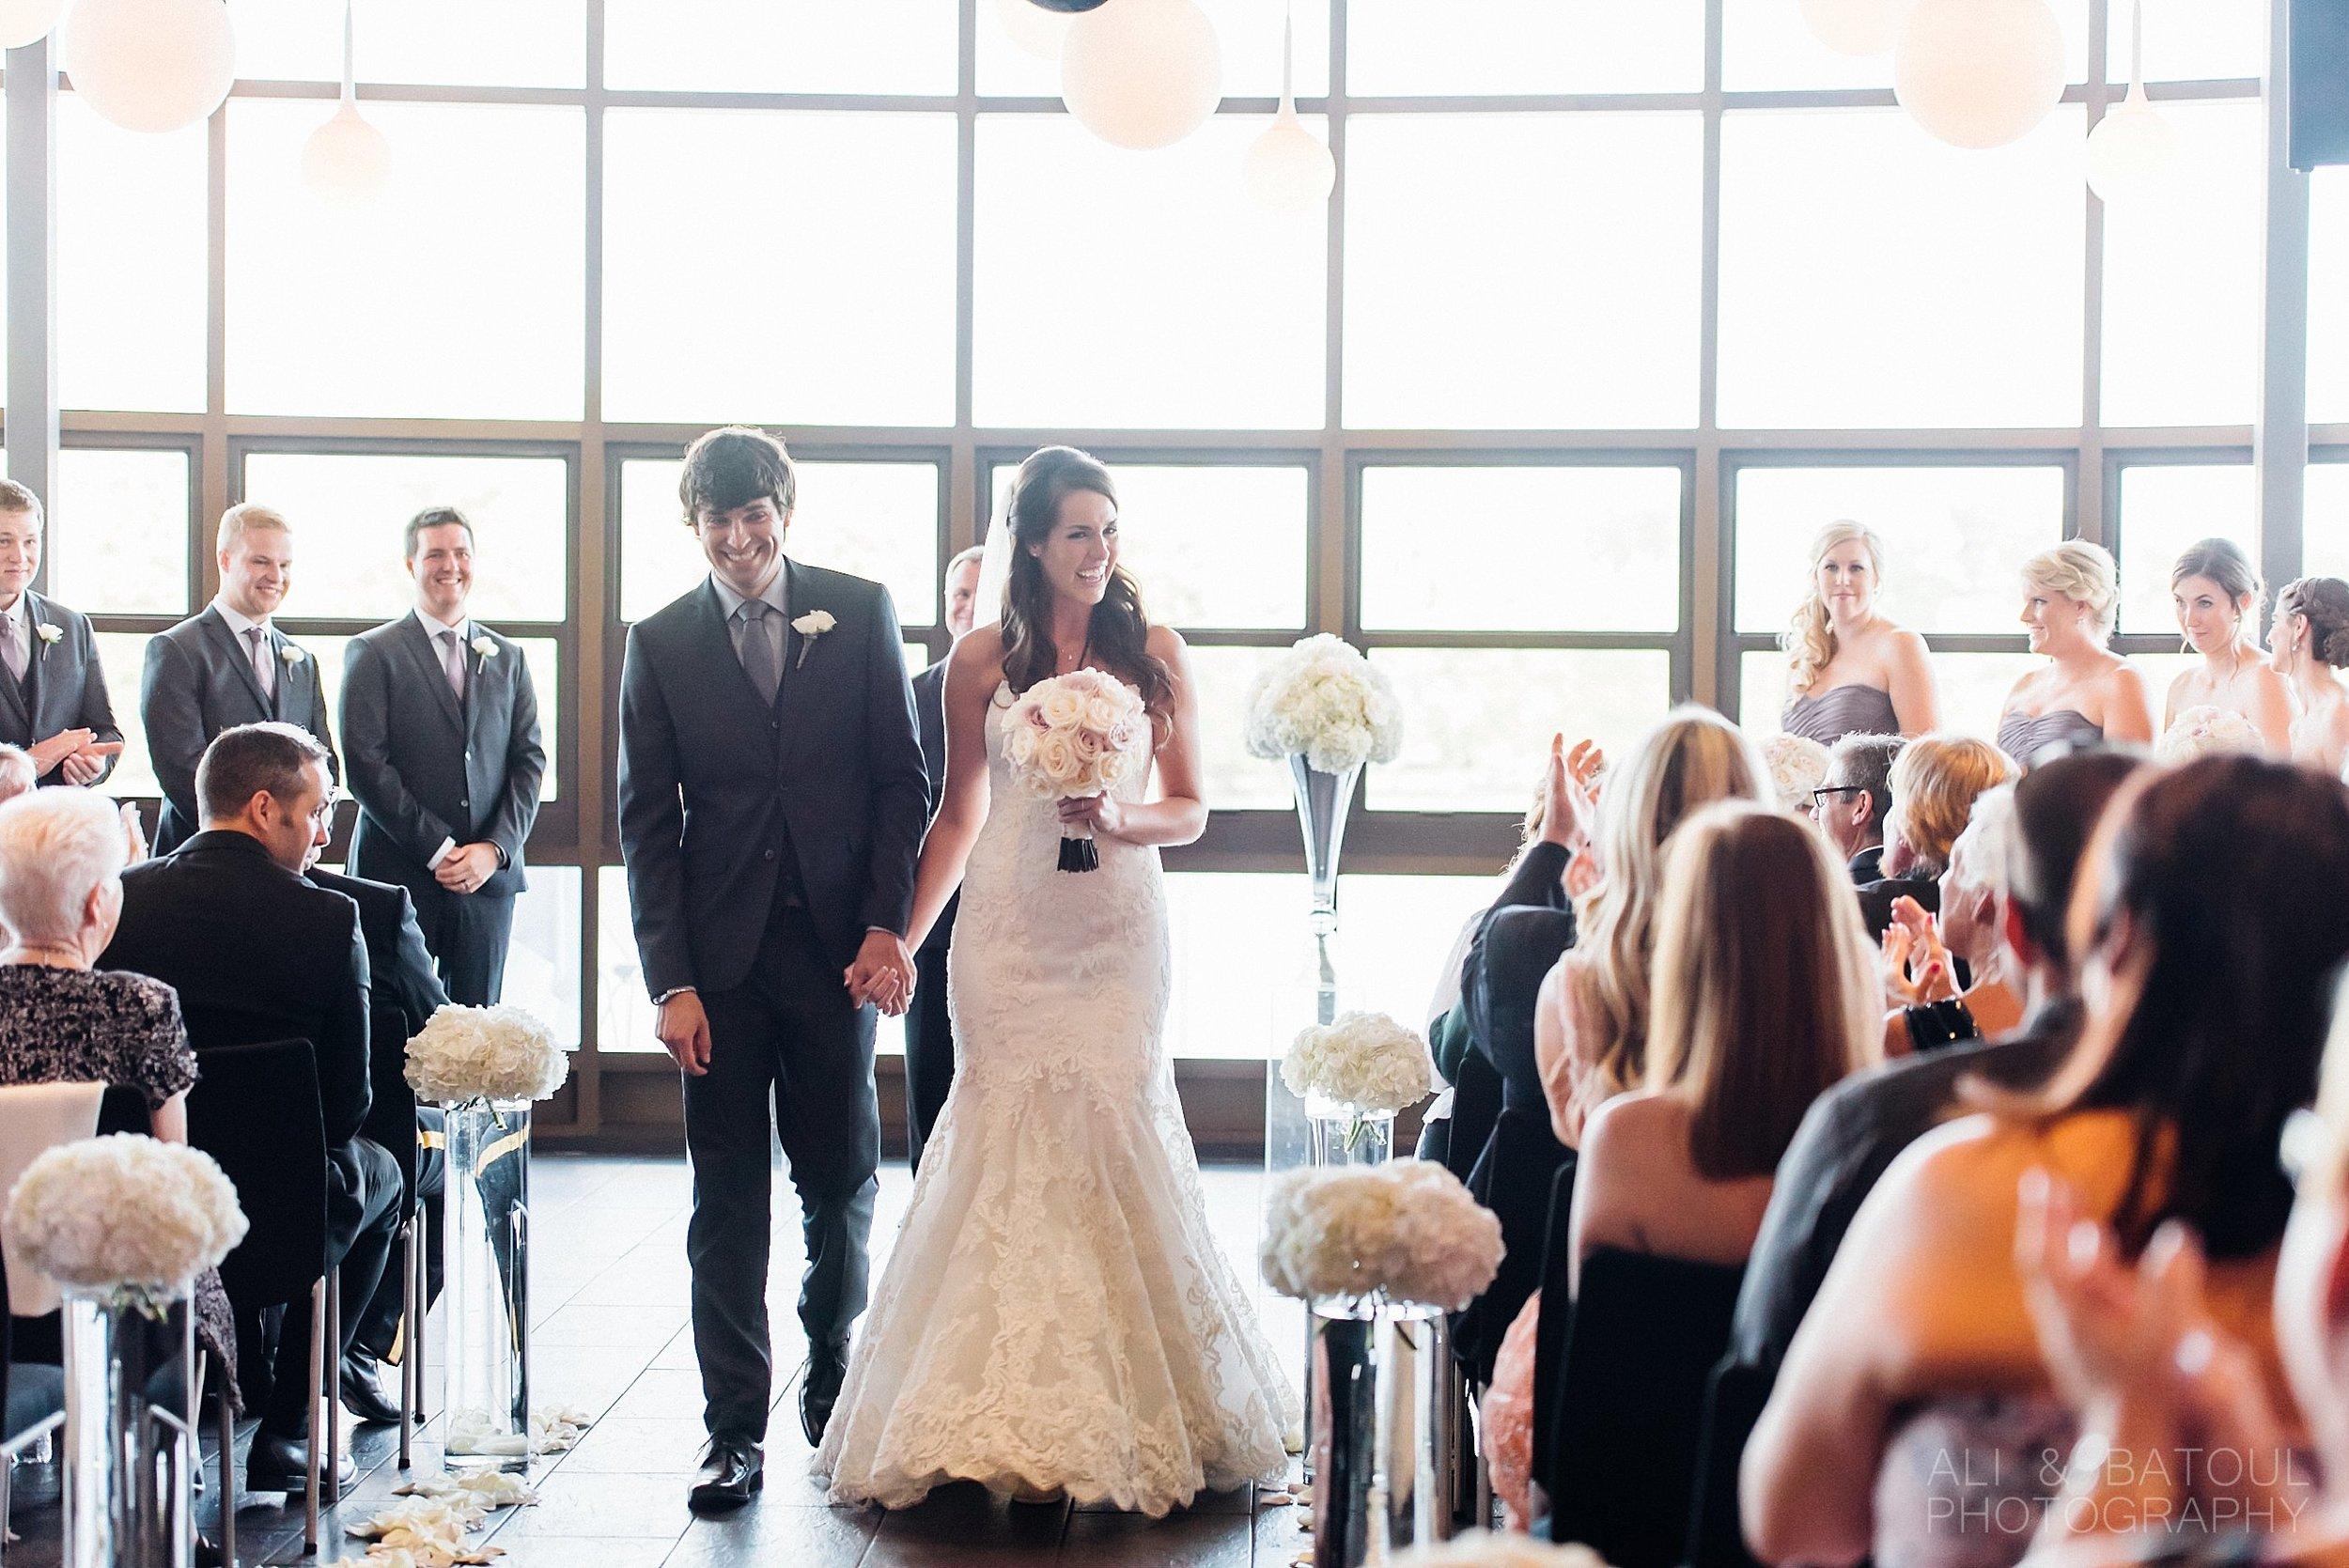 Ali & Batoul Photography - Documentary Fine Art Ottawa Wedding Photography_0039.jpg